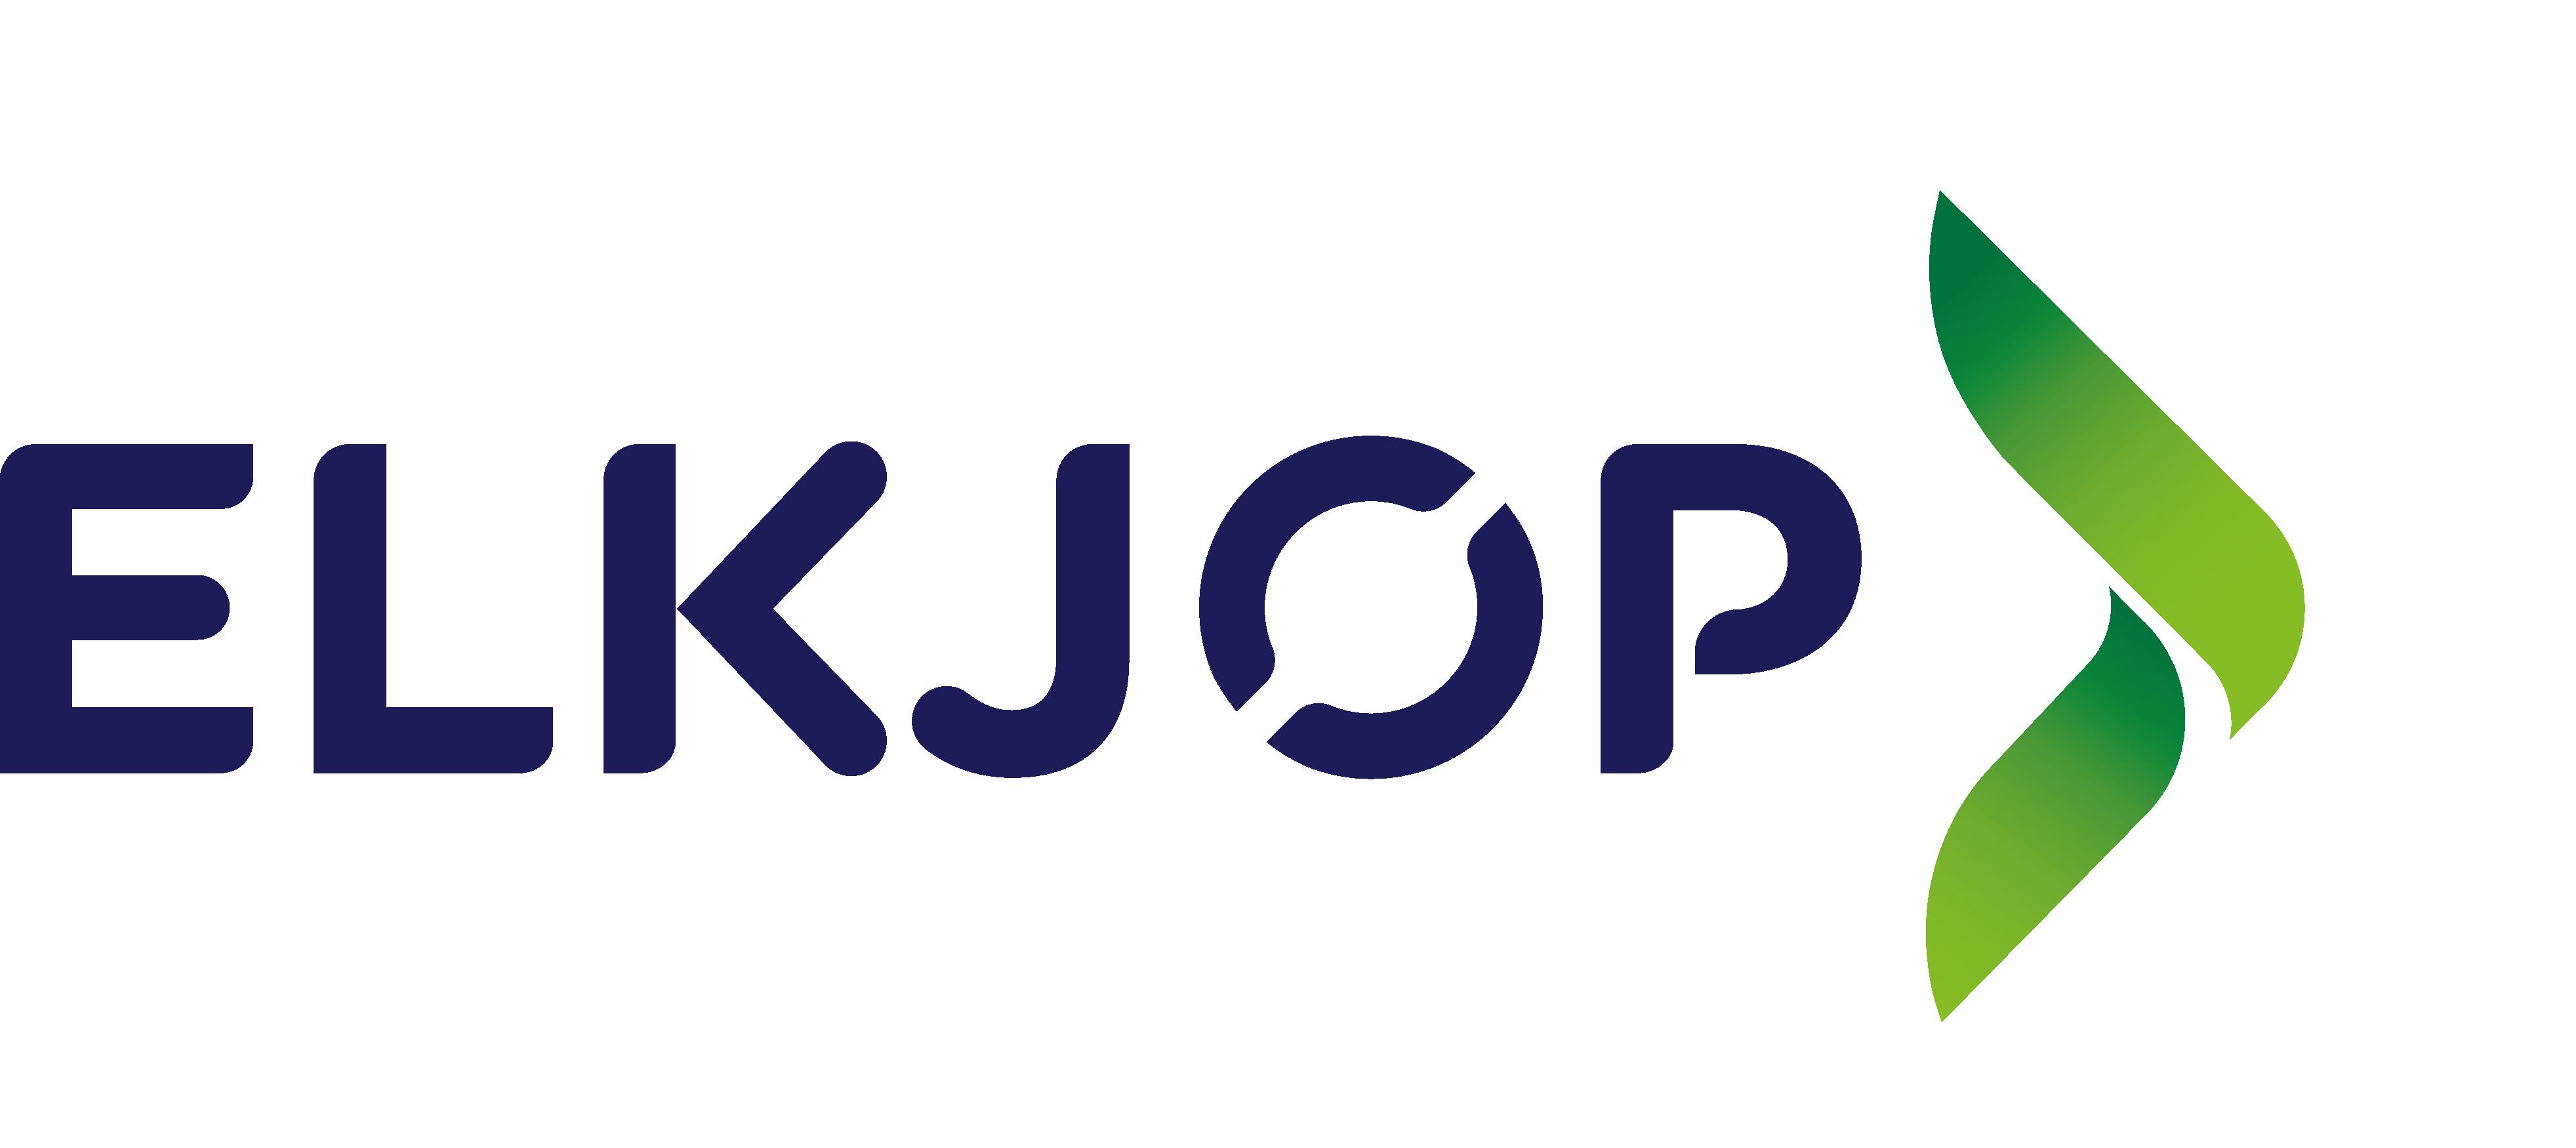 Elkjøp logo